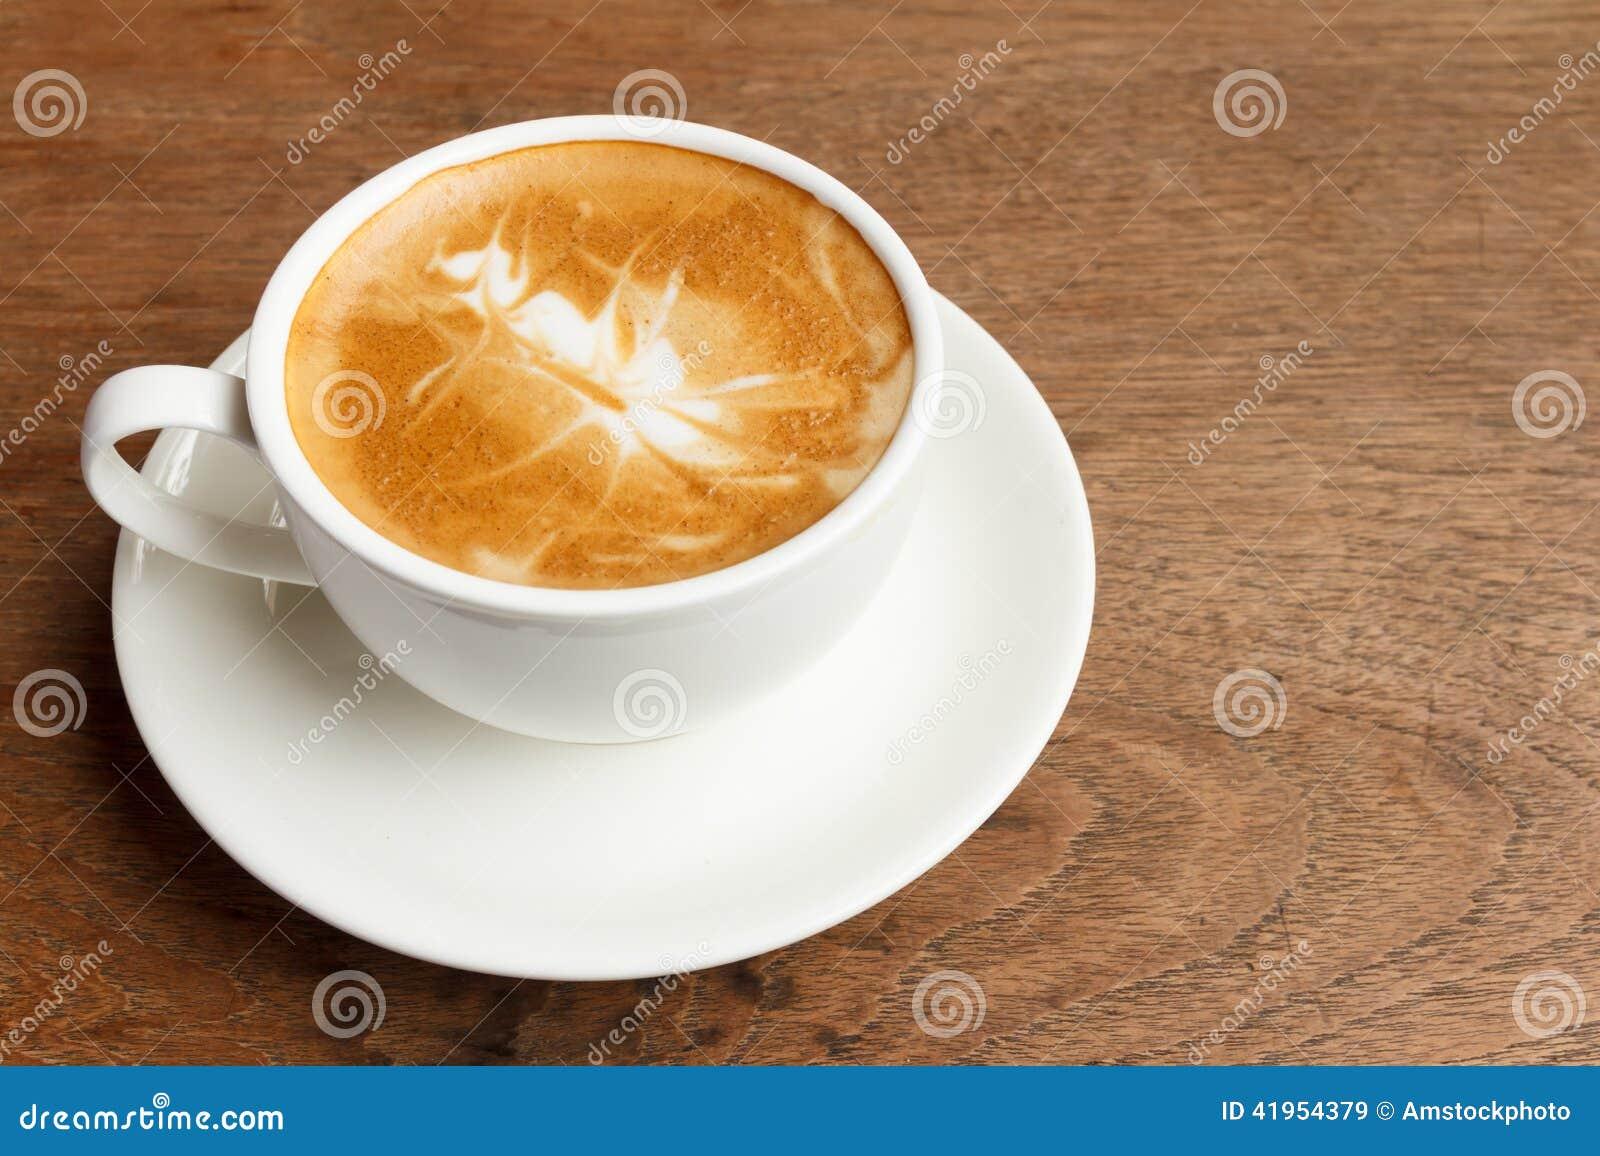 Filiżanka cappuccino na drewnianym stole